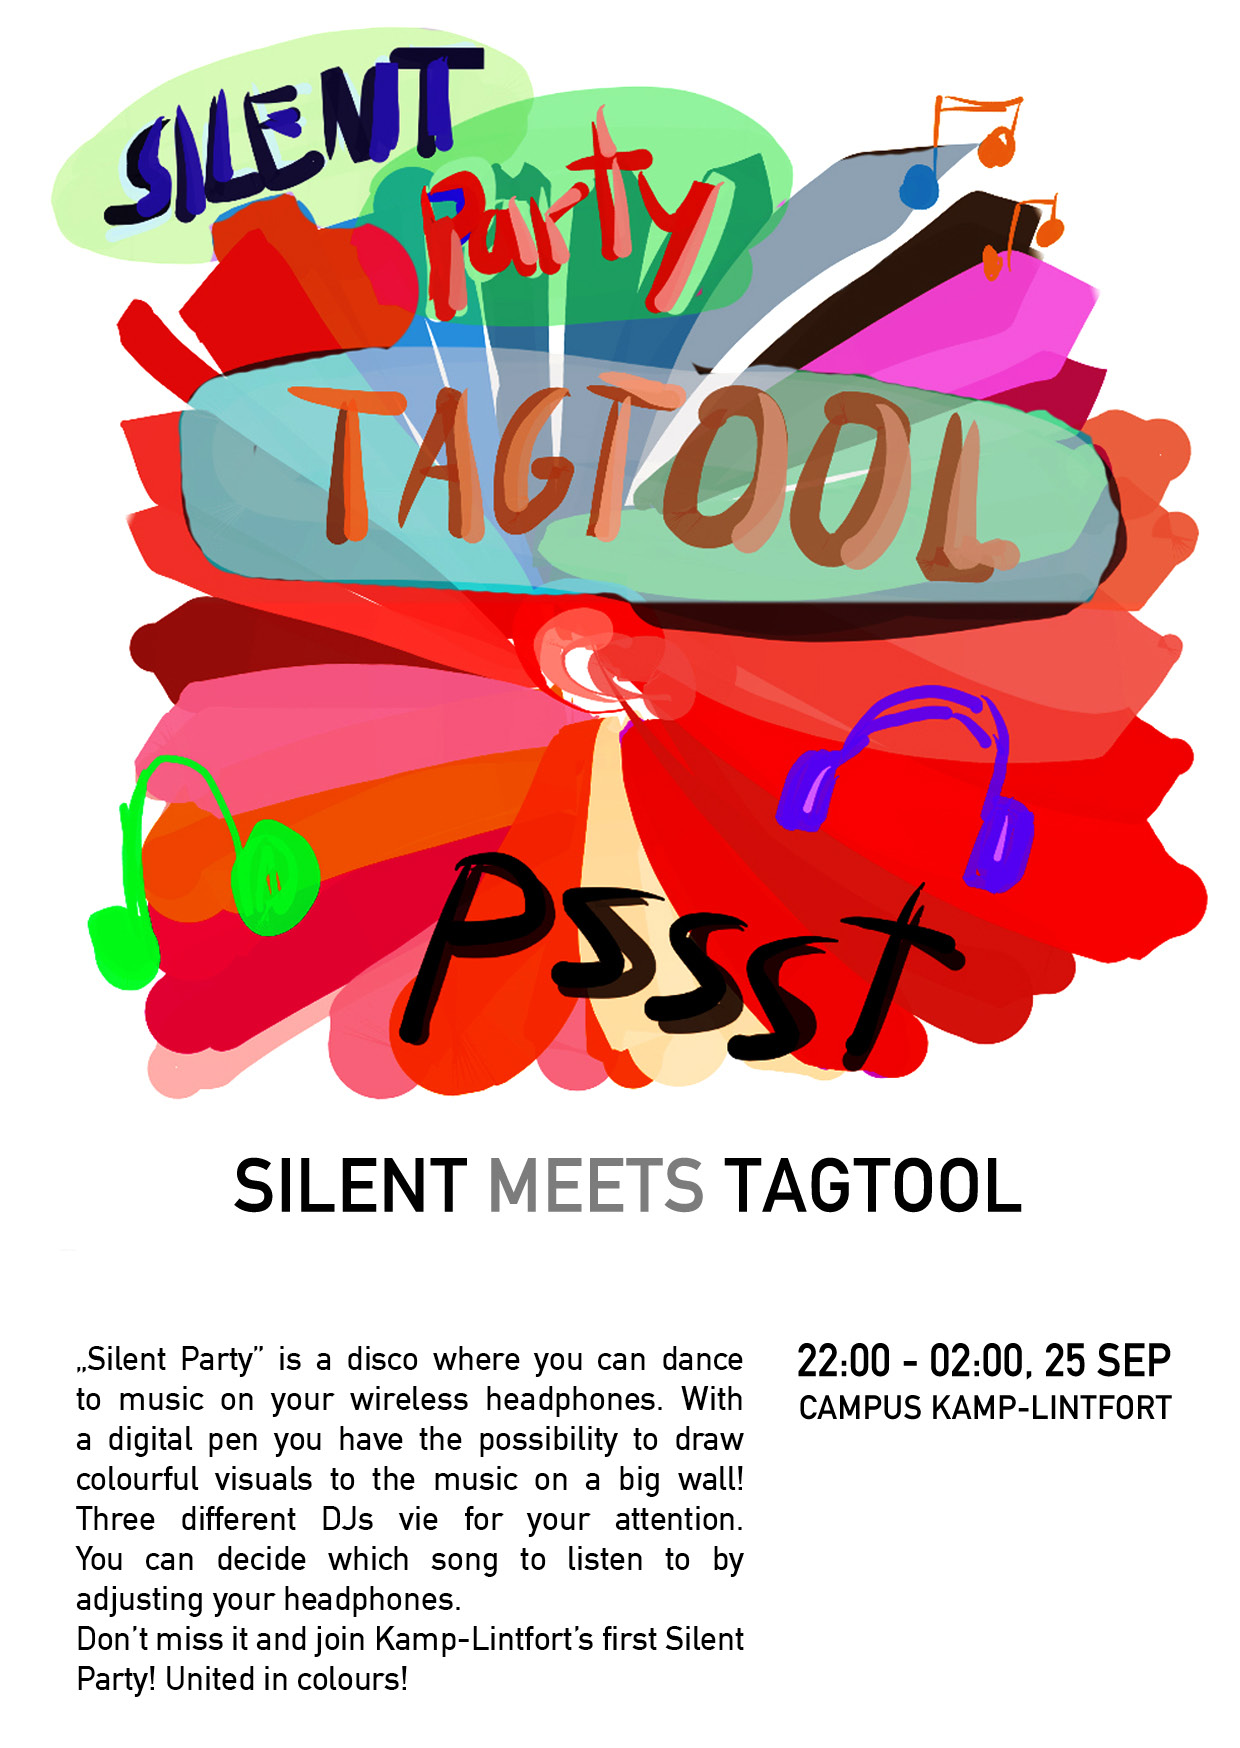 Silent Party Campus Kamp-Lintfort